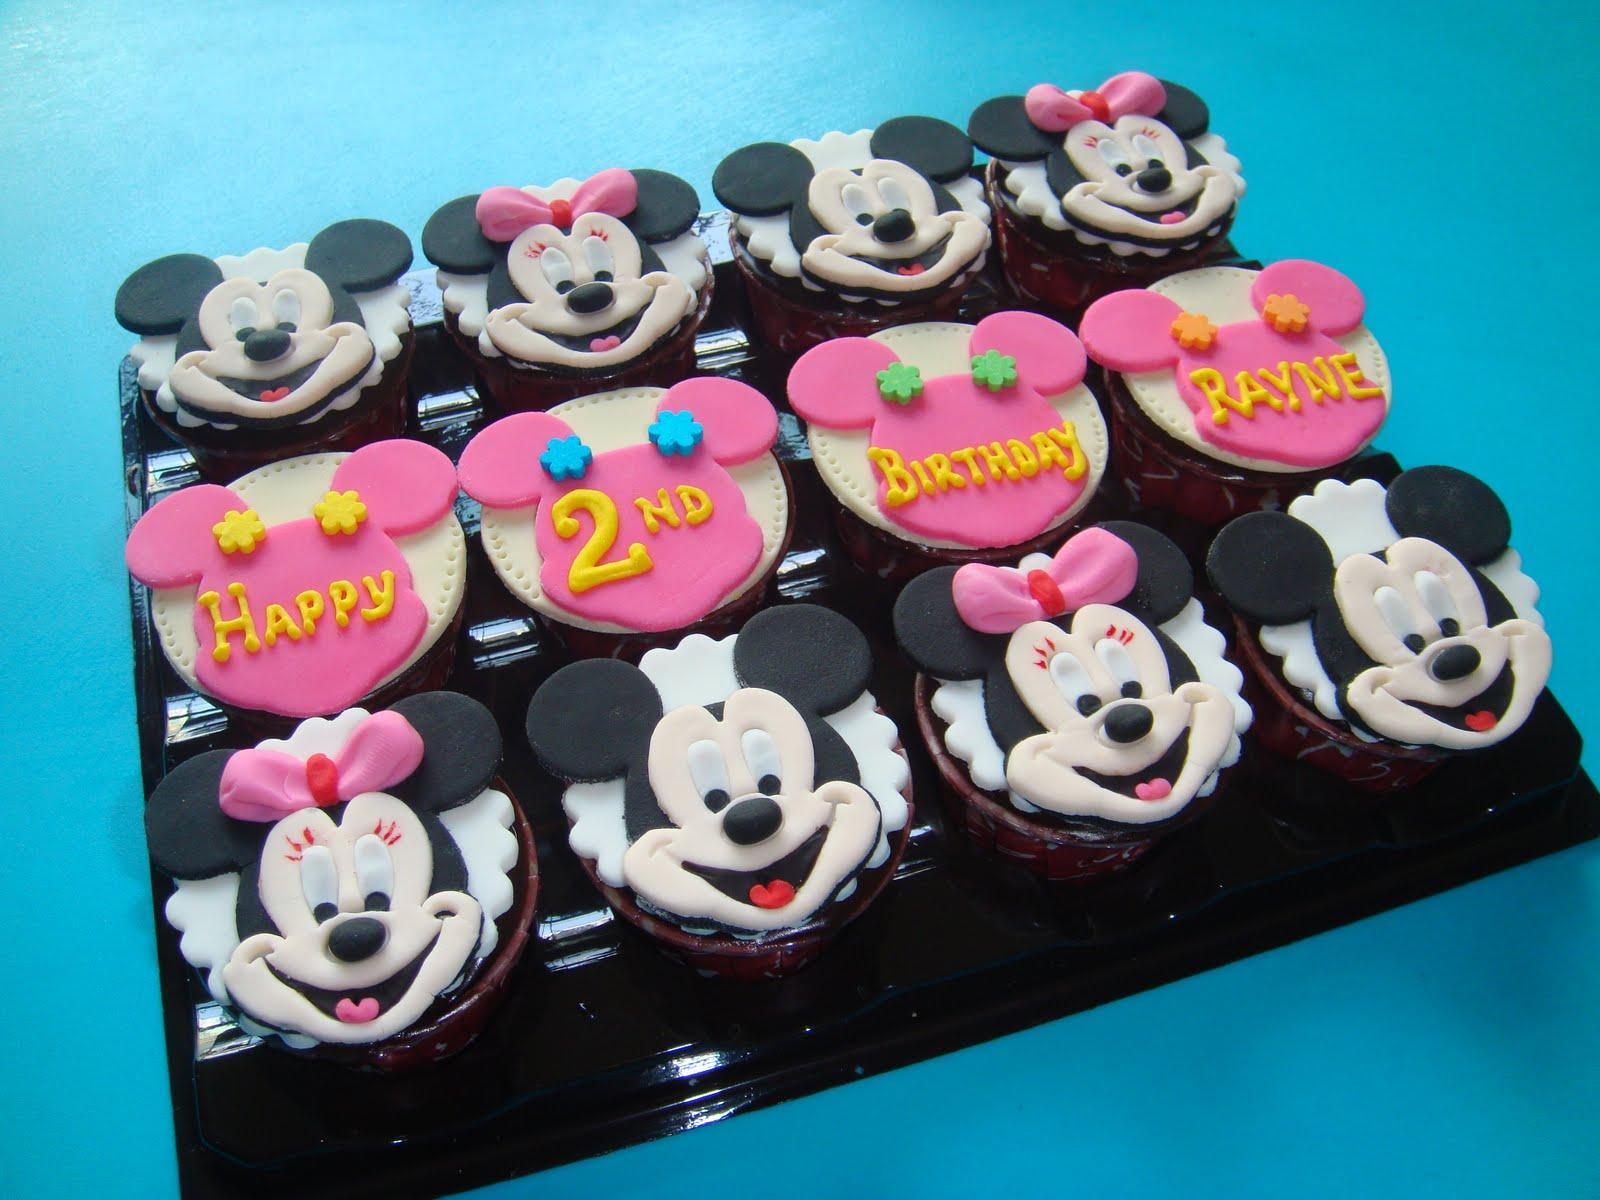 Yummy Baking Mickey Amp Minnie Cupcakes